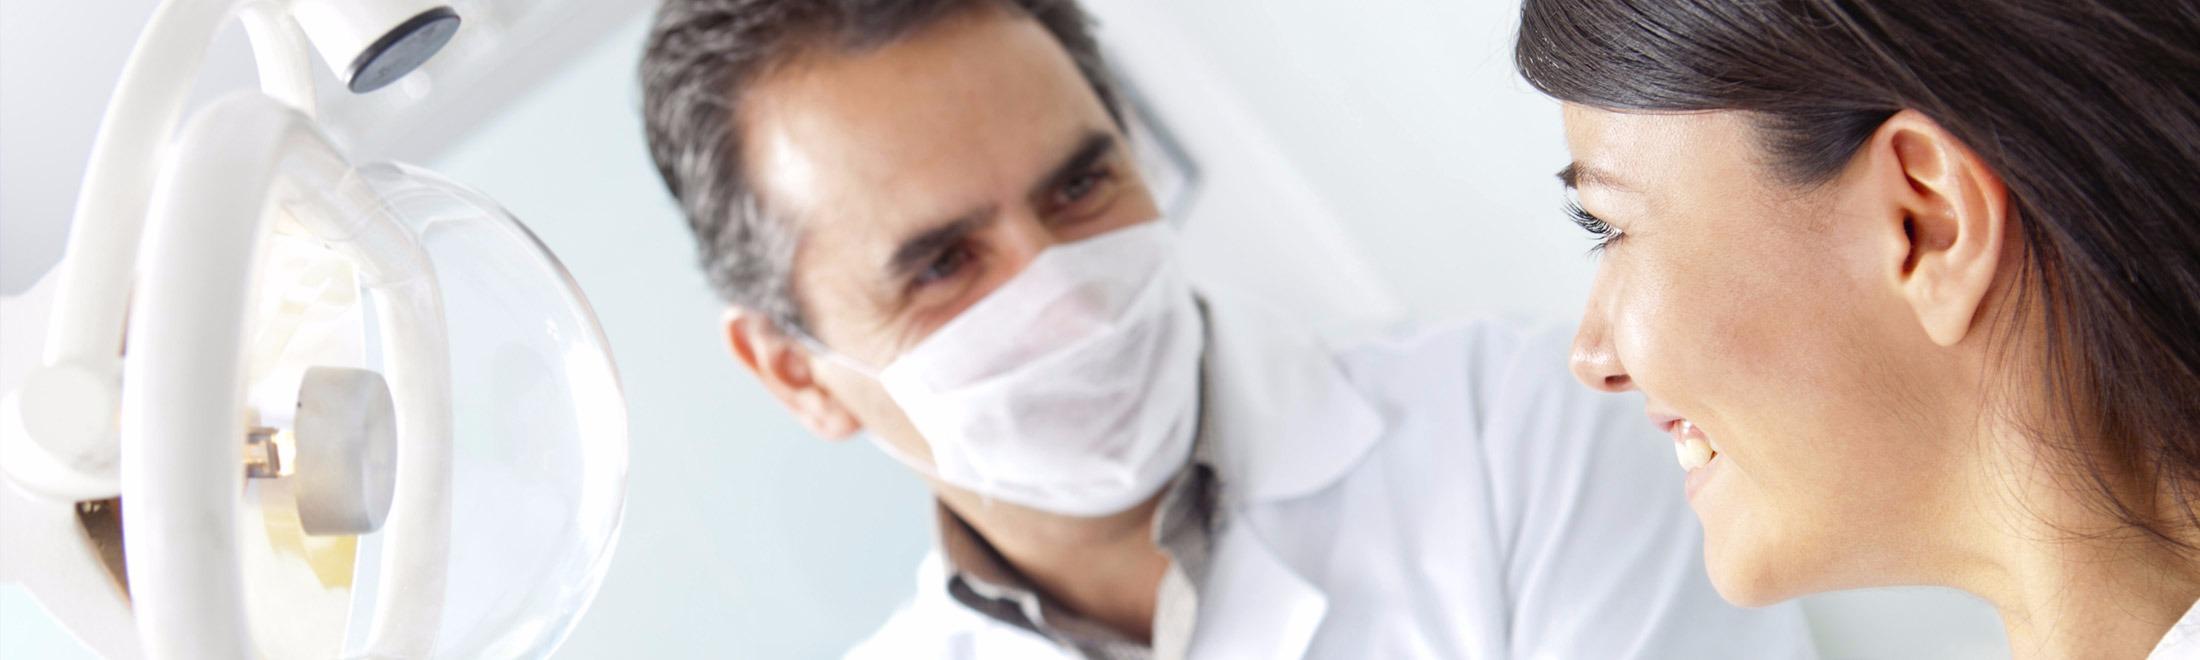 Eastside Dental Associates image 5